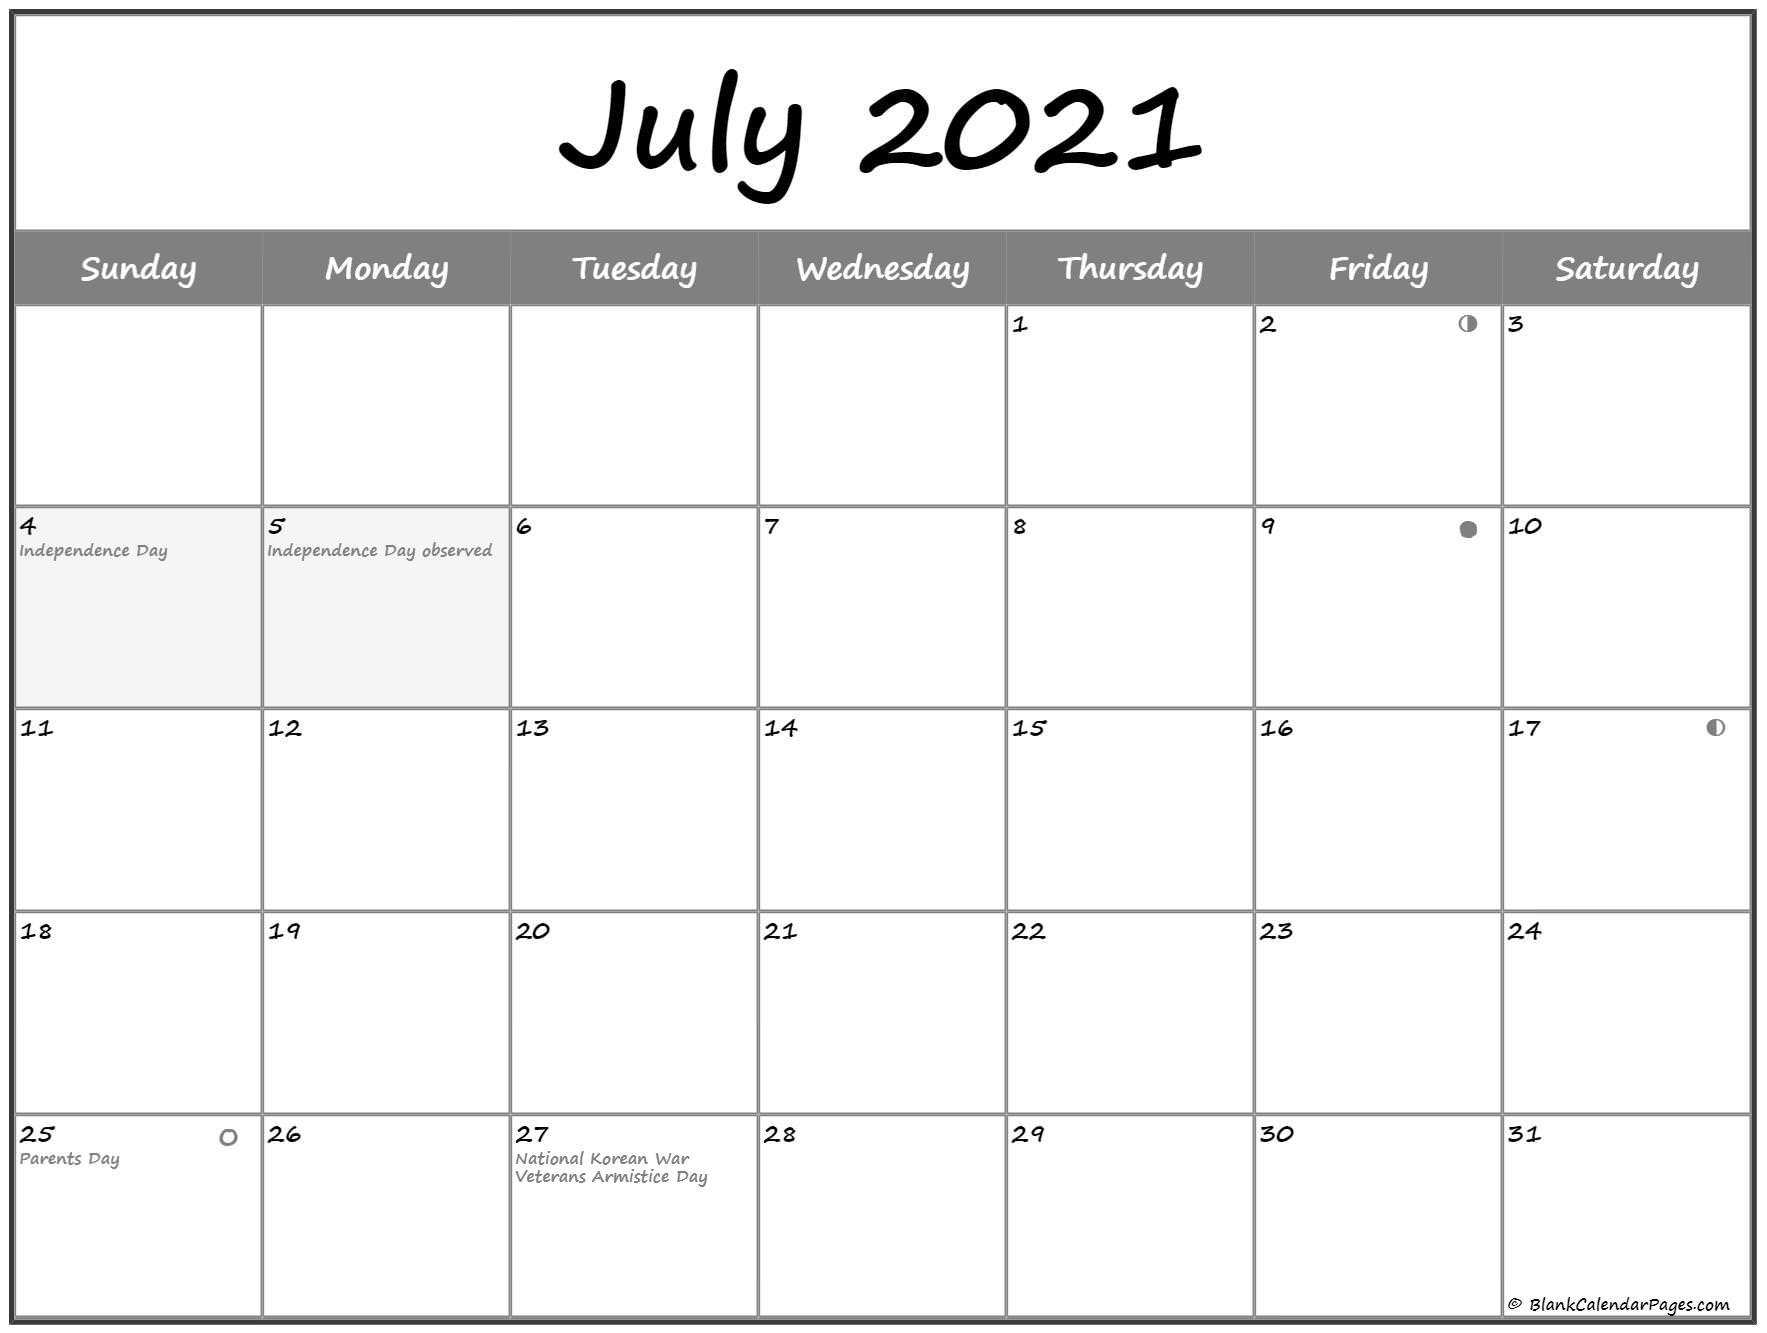 July 2021 Lunar Calendar | Moon Phase Calendar Intended For 2021 Deer Hunting Lunar Calendar